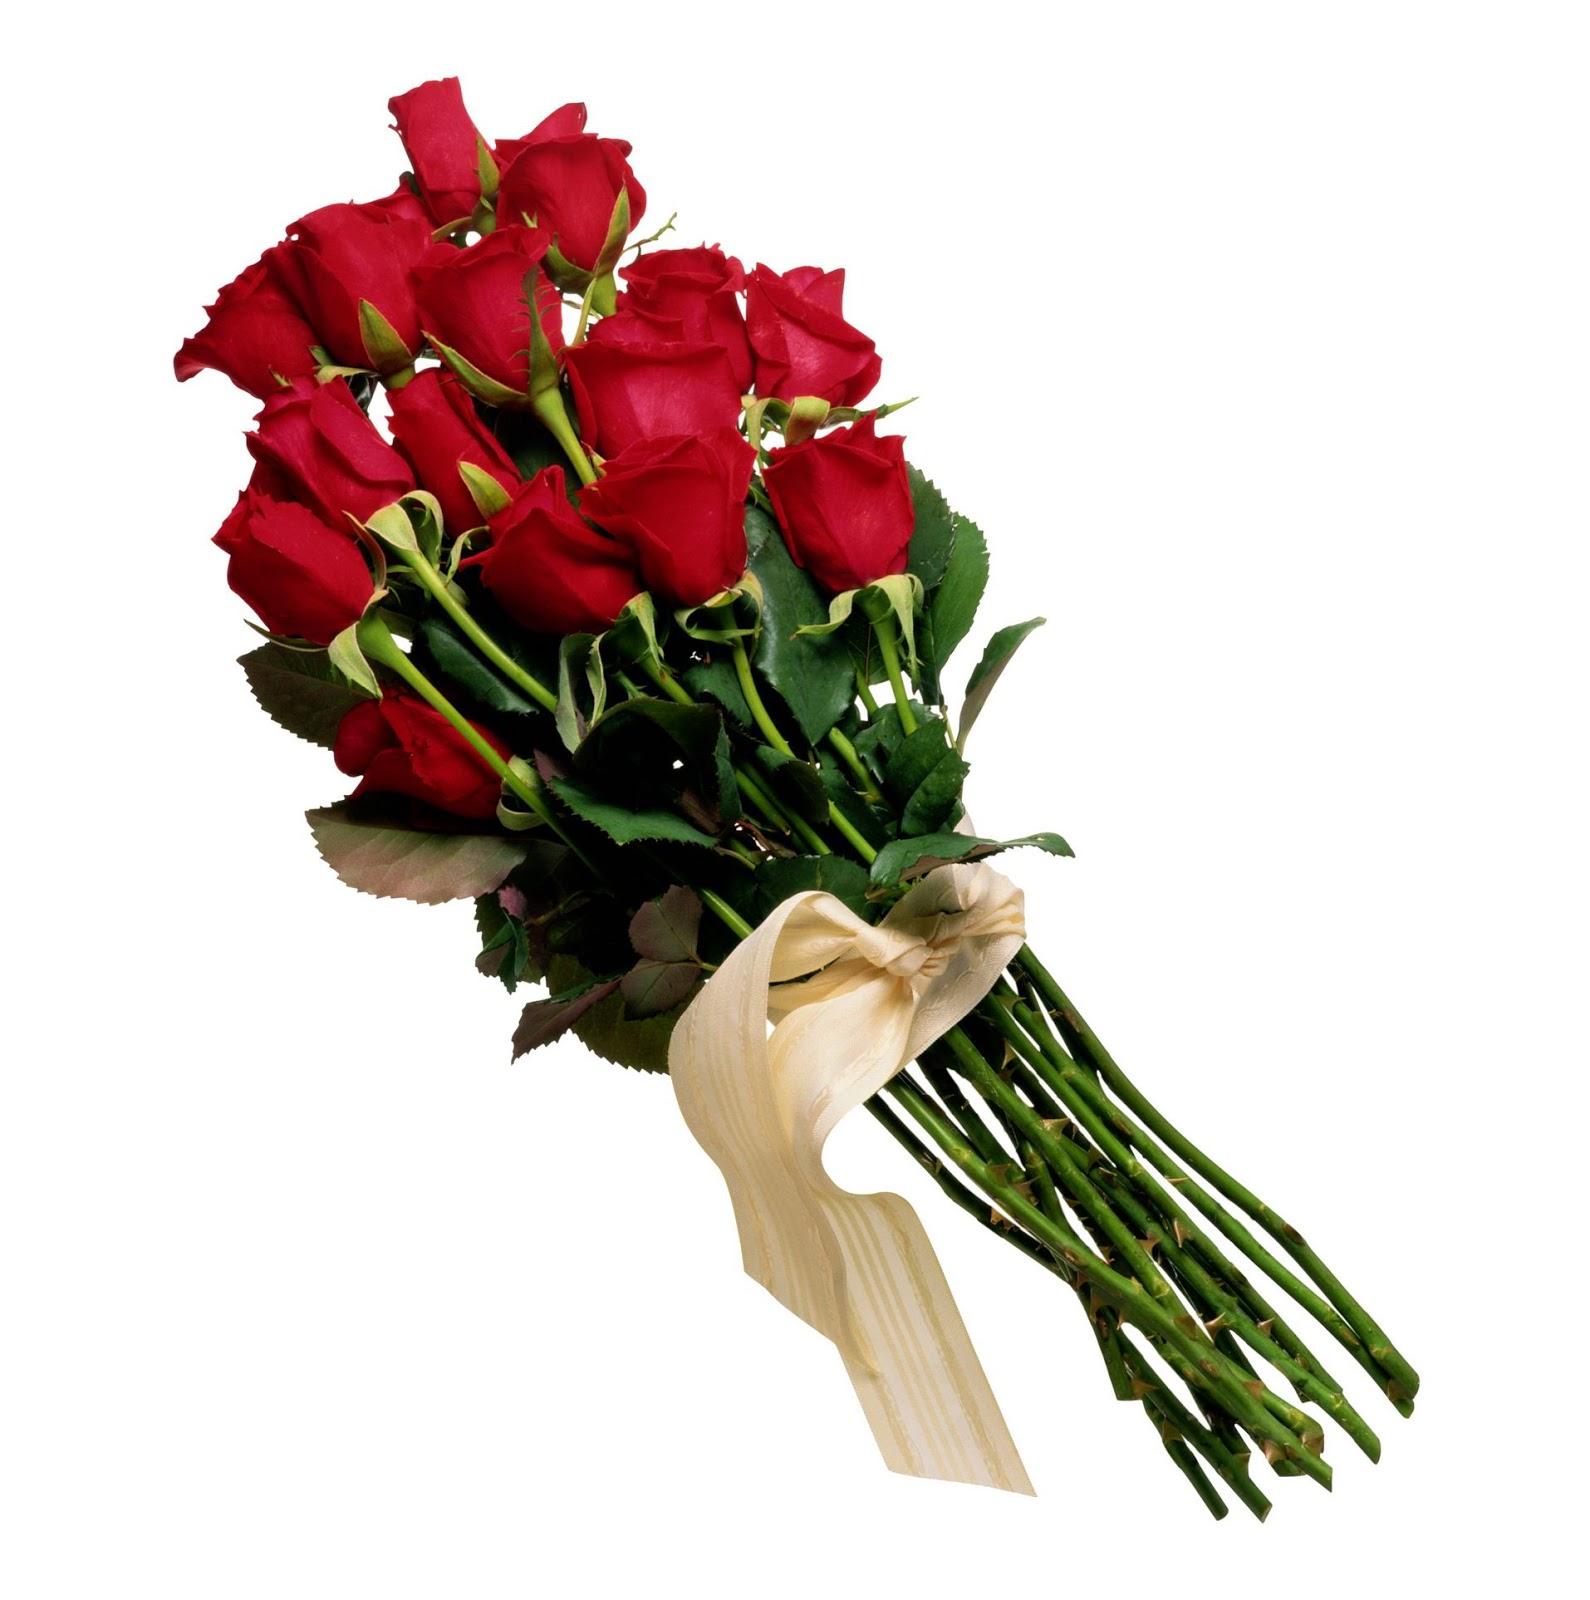 Intercementerio jose silvent martinez - Ramos de flores bonitos ...